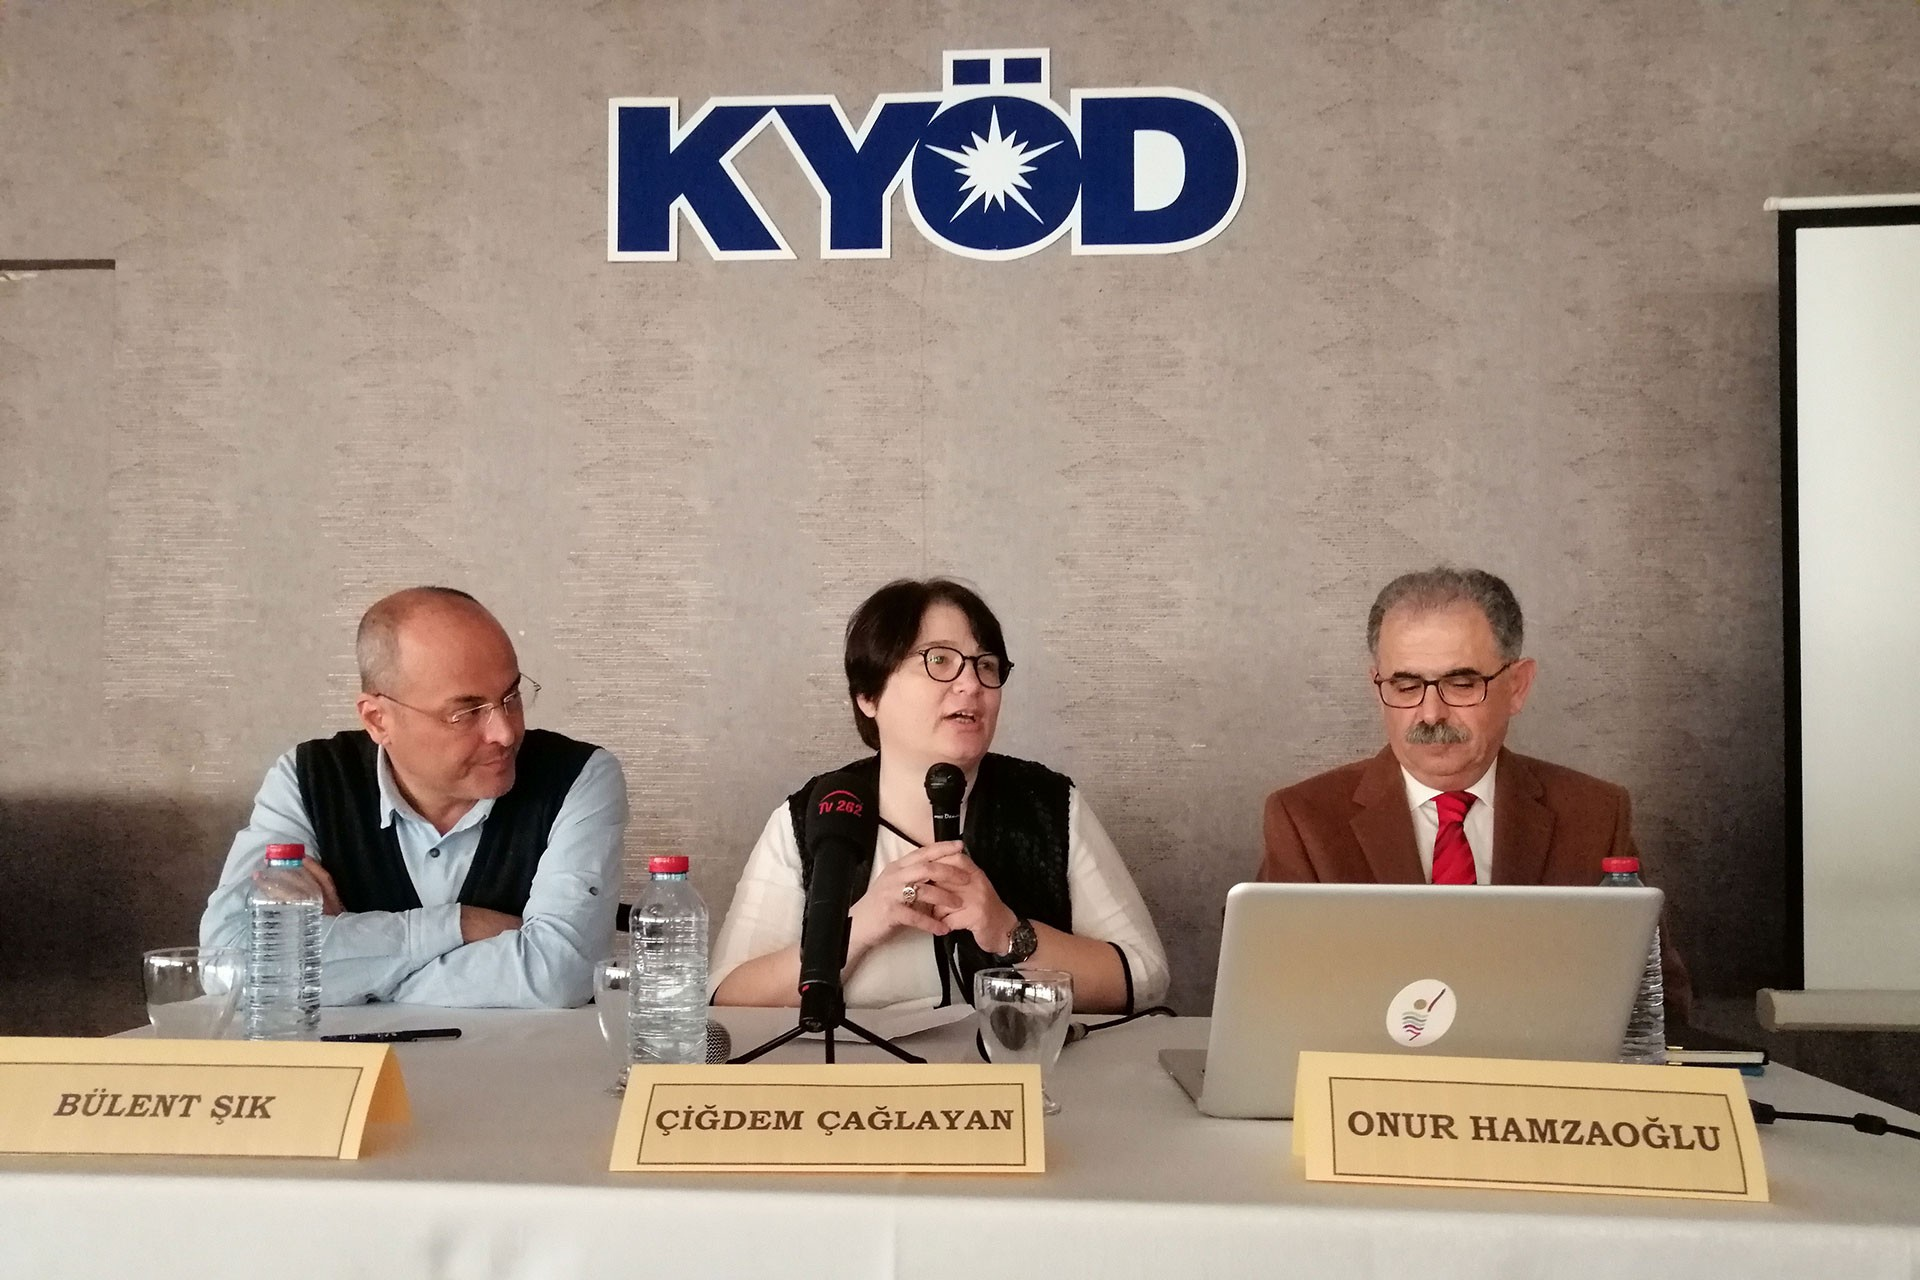 (Soldan sağa) Yrd. Doç. Dr. Bülent Şık, Prof. Dr. Çiğdem Çağlayan ve Prof. Dr. Onur Hamzaoğlu